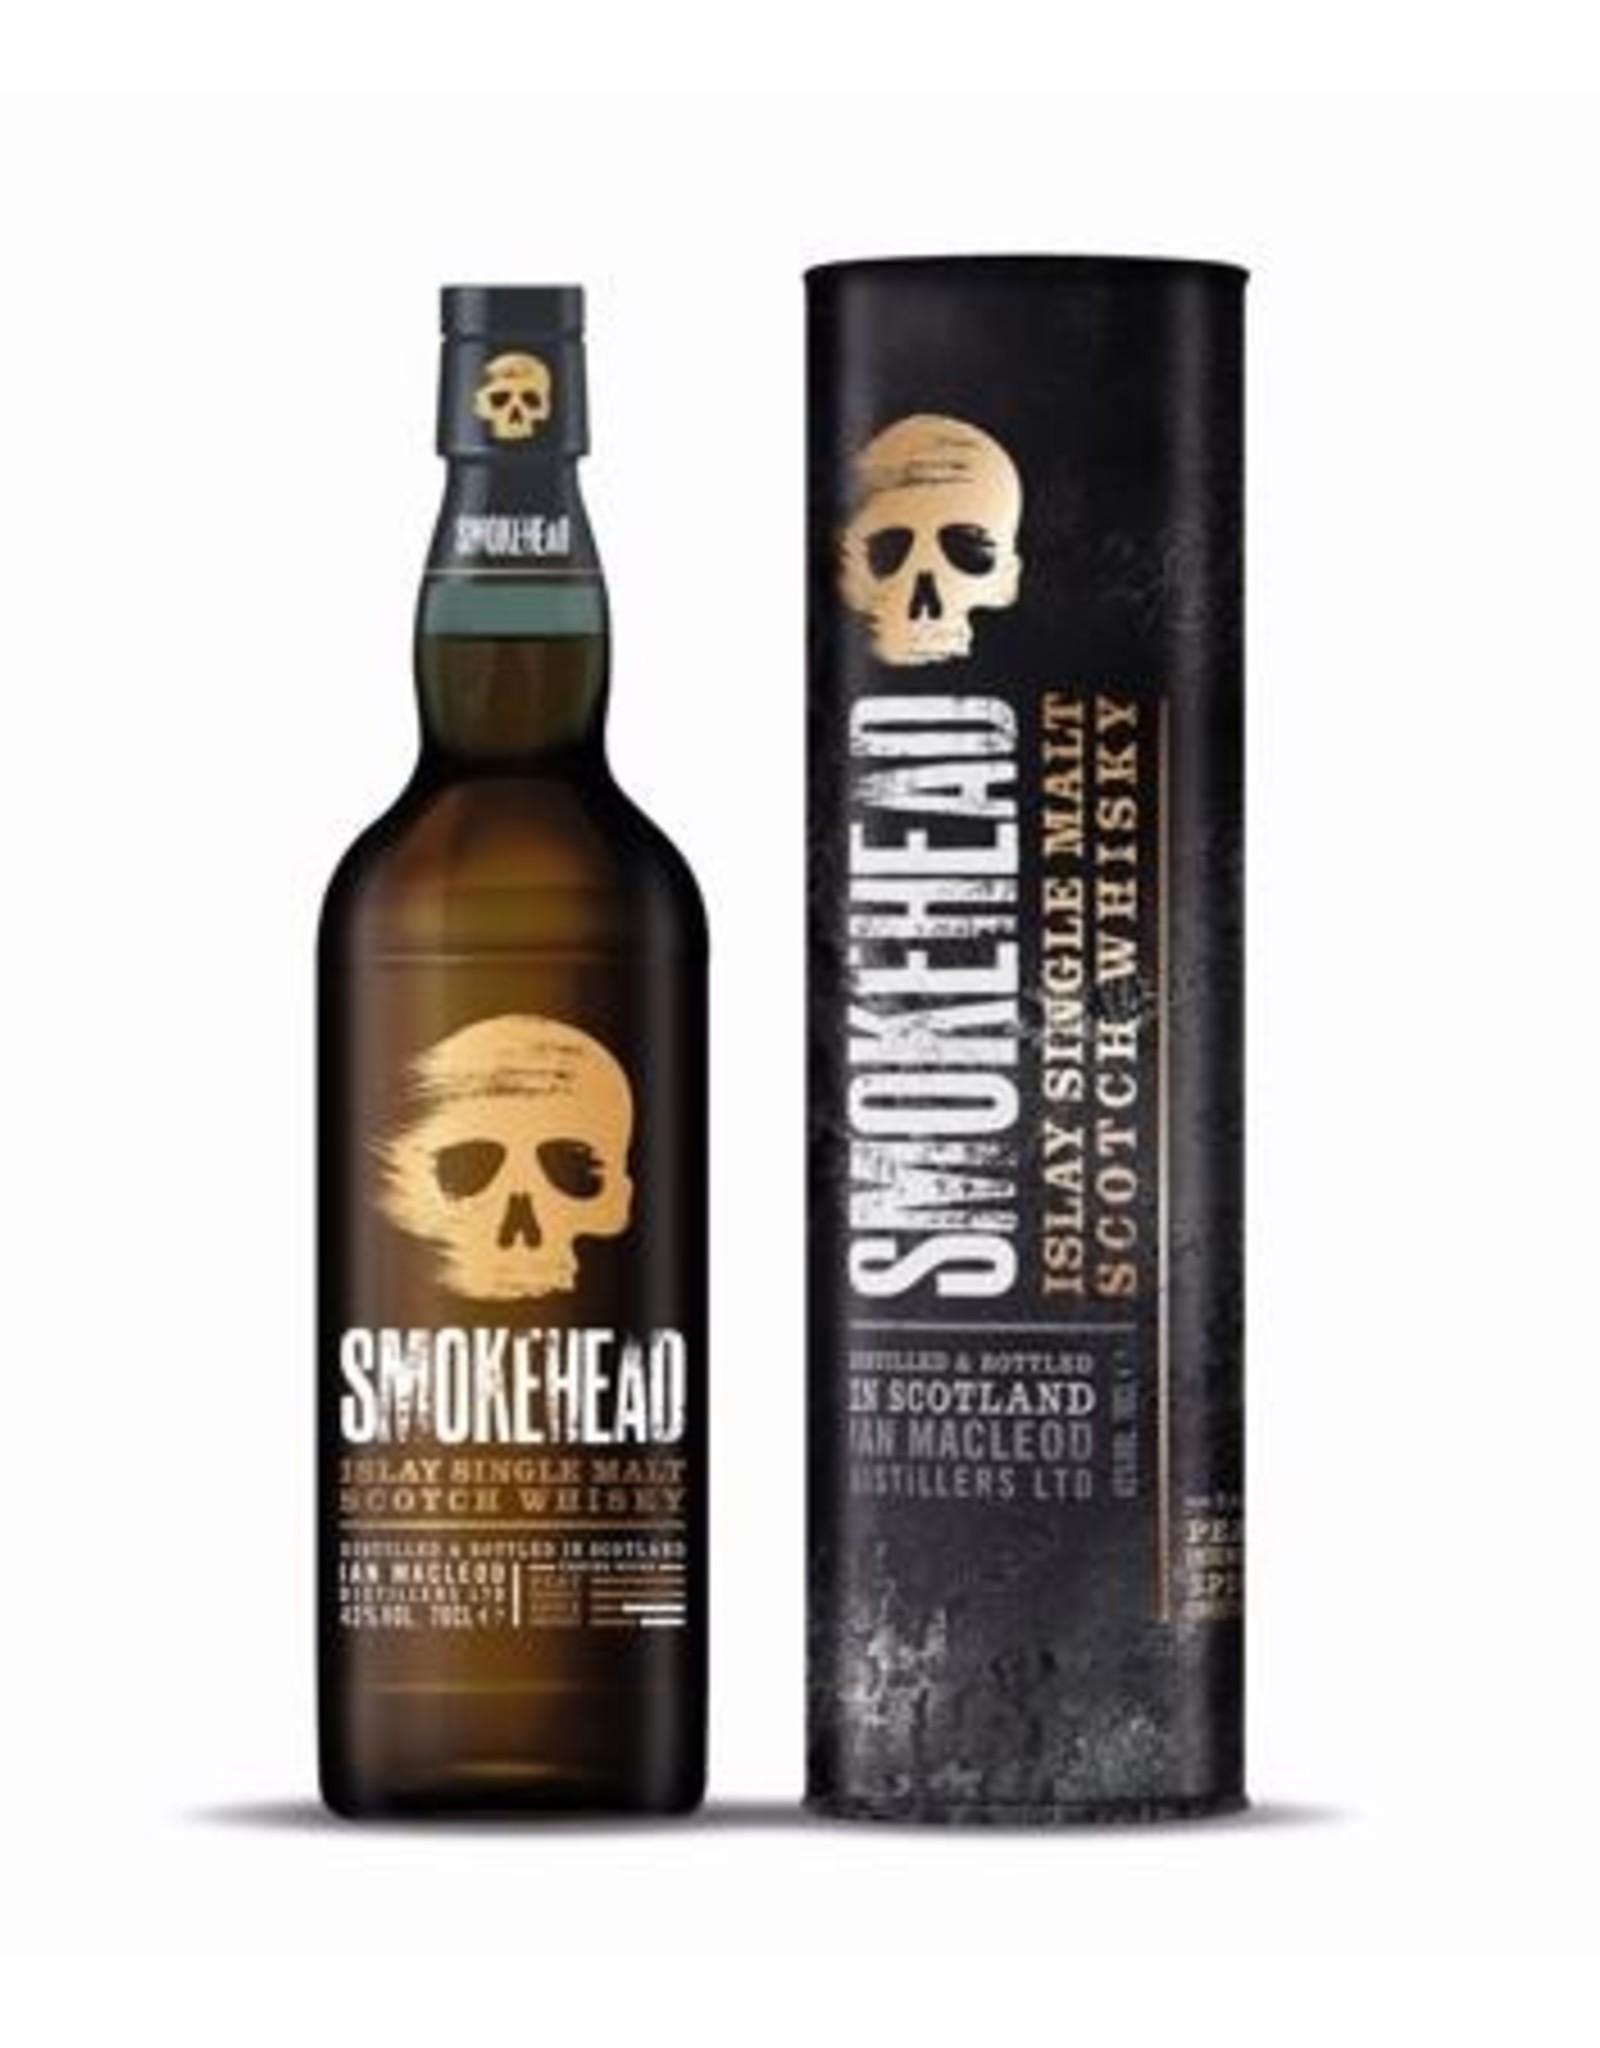 Smokehead Smokehead Islay